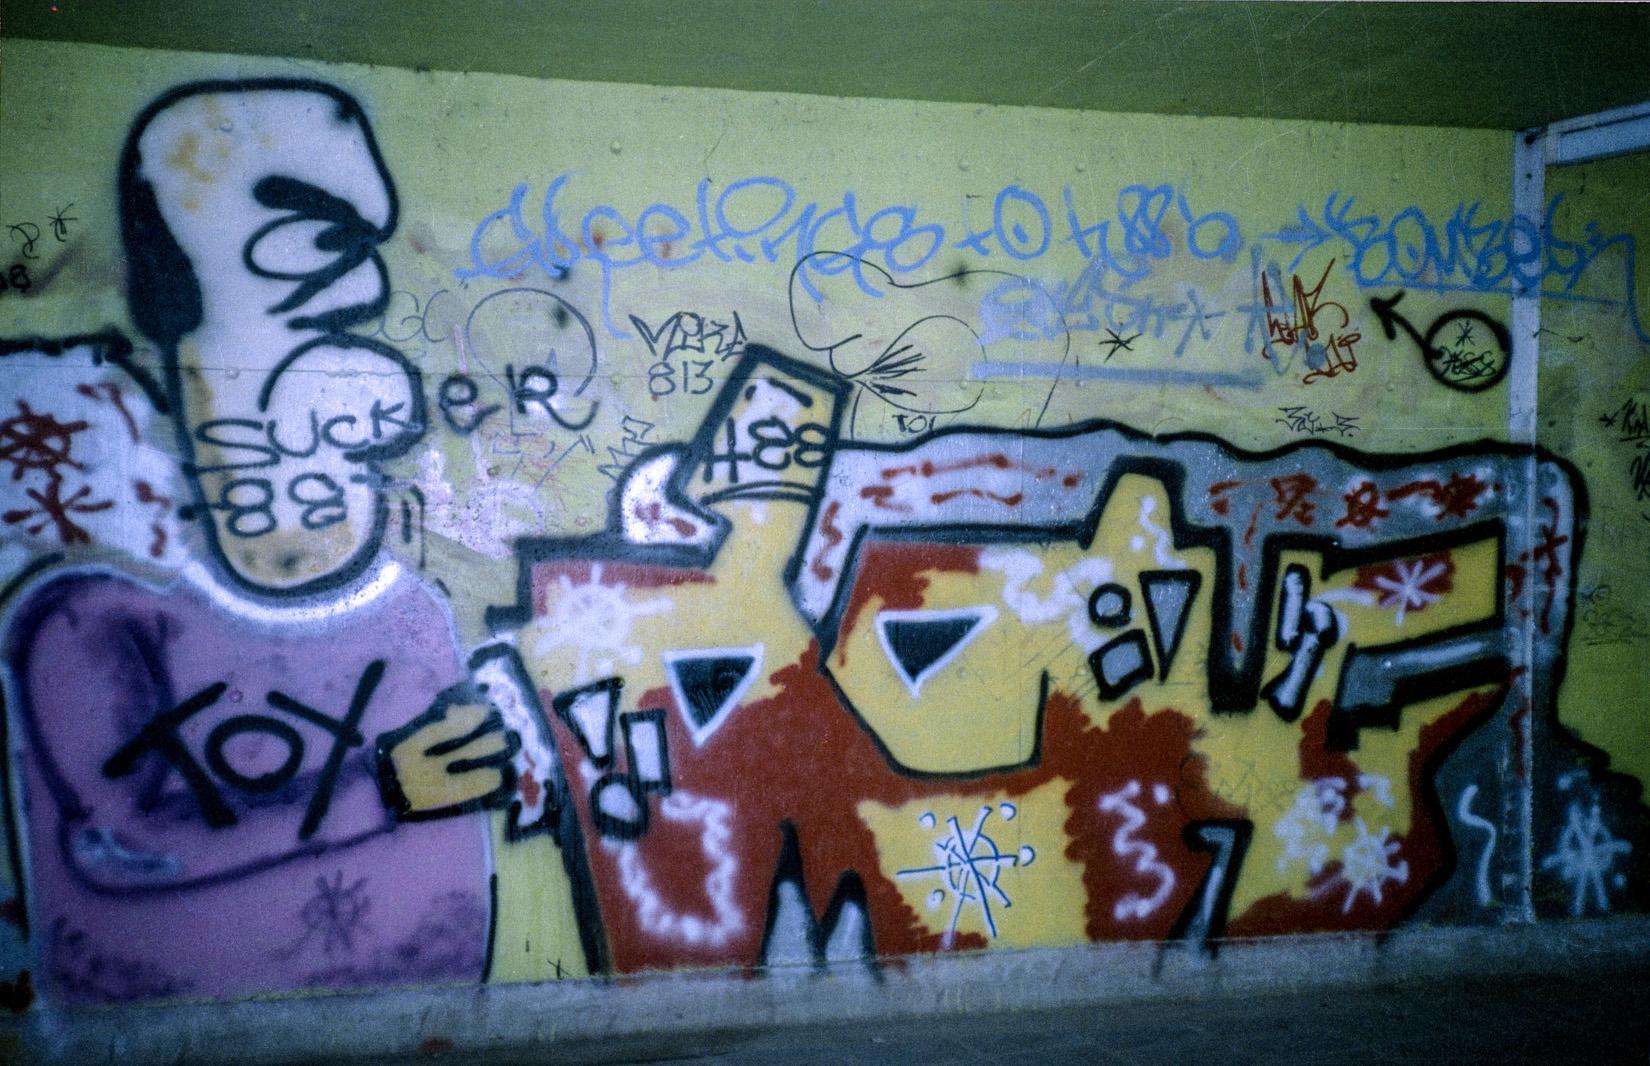 Frankfurt_Graffiti_1988_1989_H88_FRC (17 von 25)